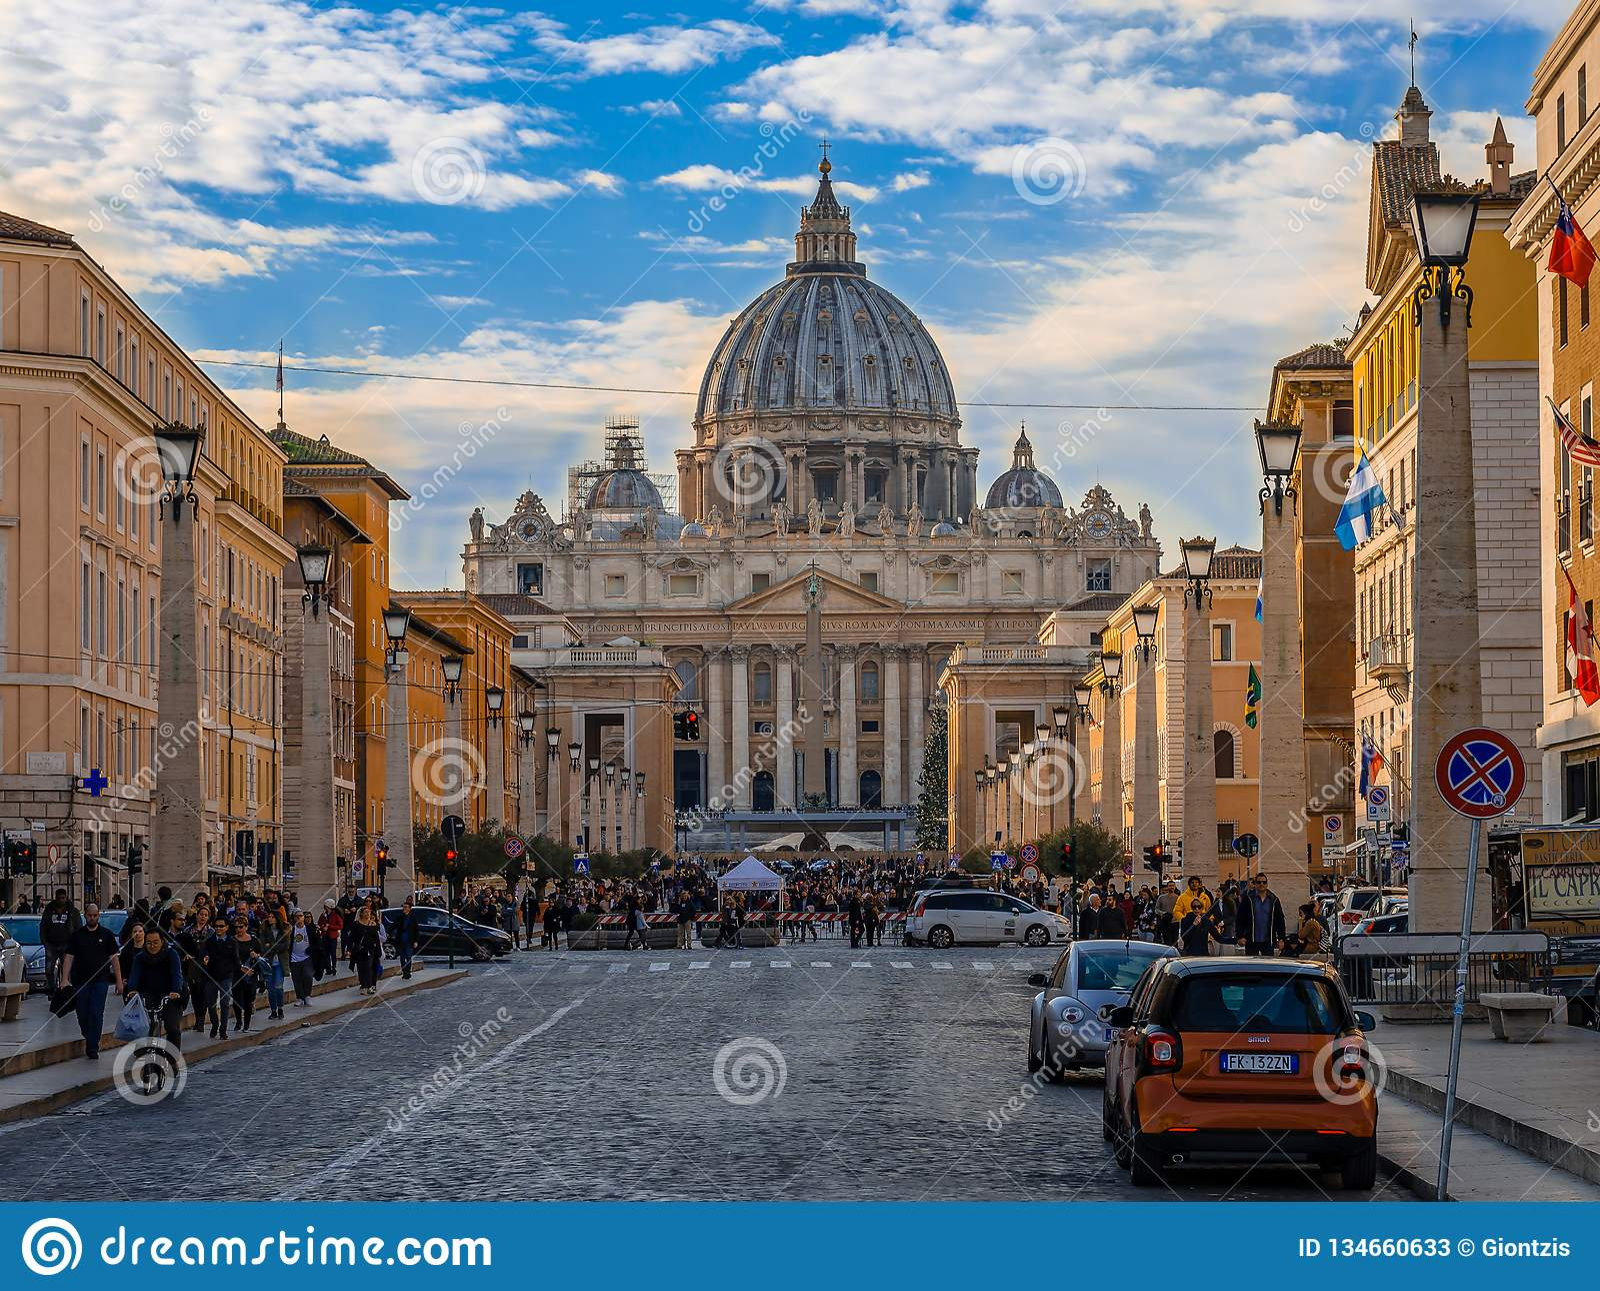 Przez della Conciliazione w Rzym,